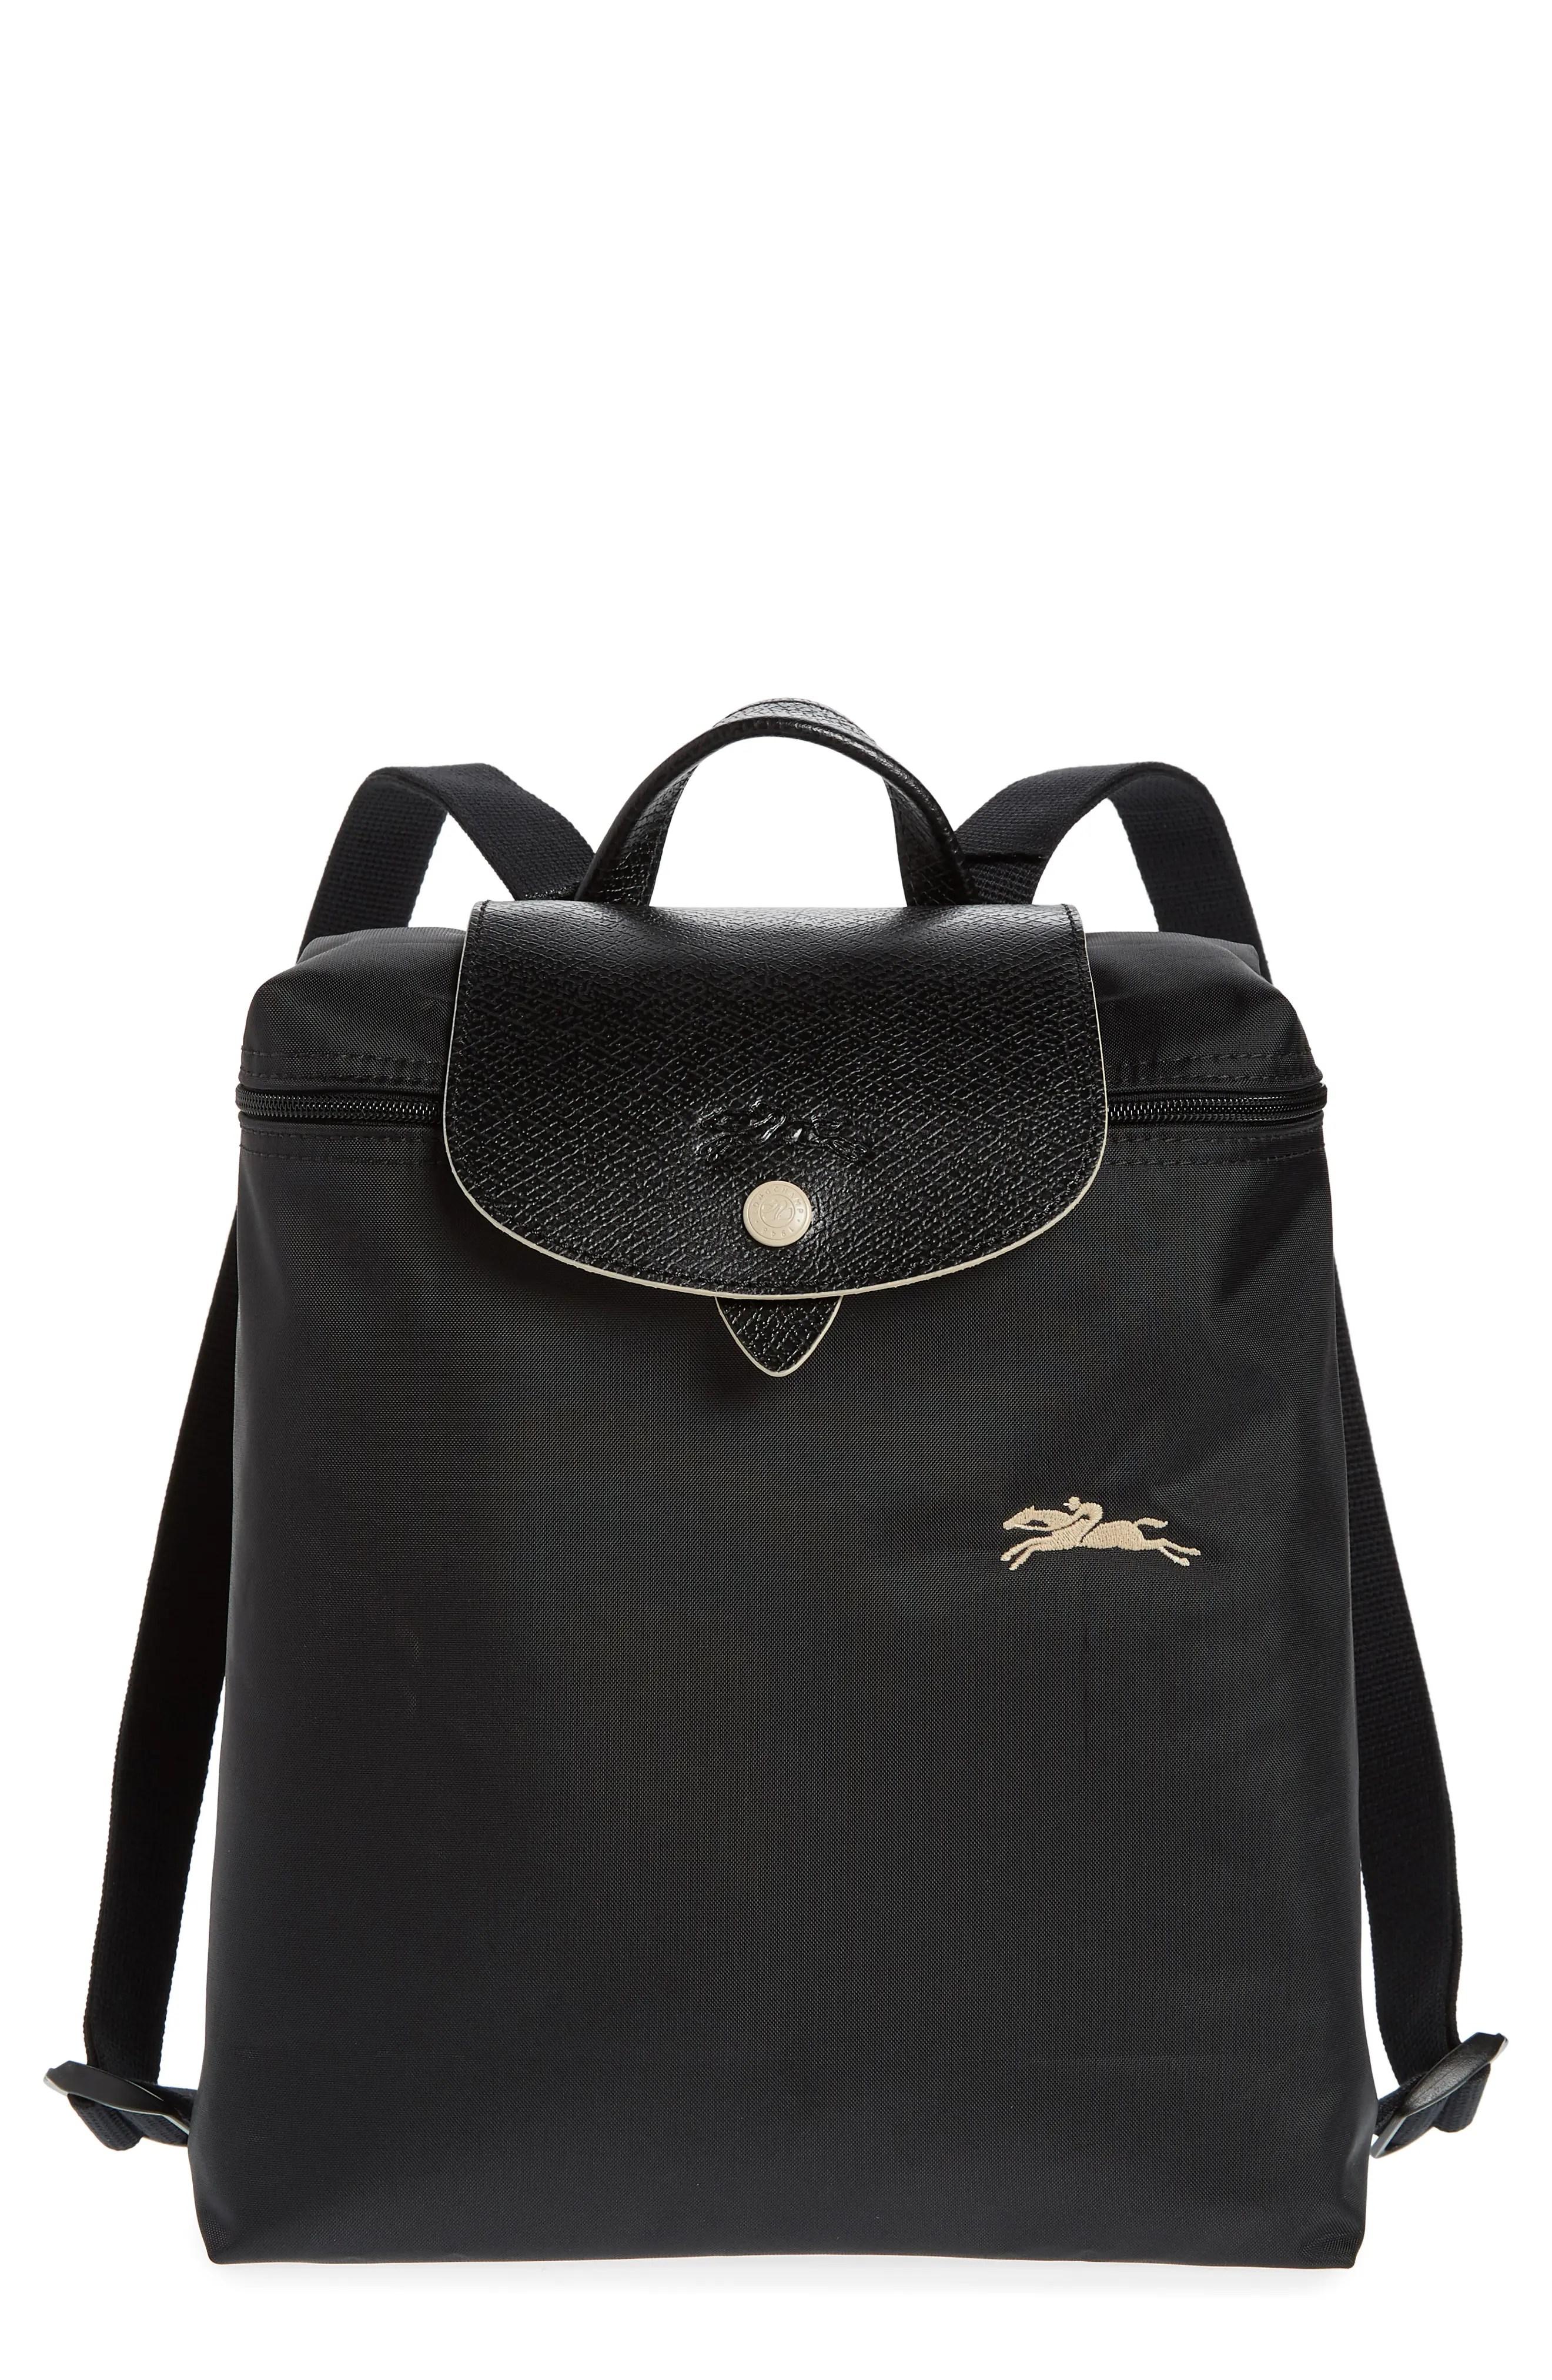 longchamp le pliage club backpack nordstrom rack